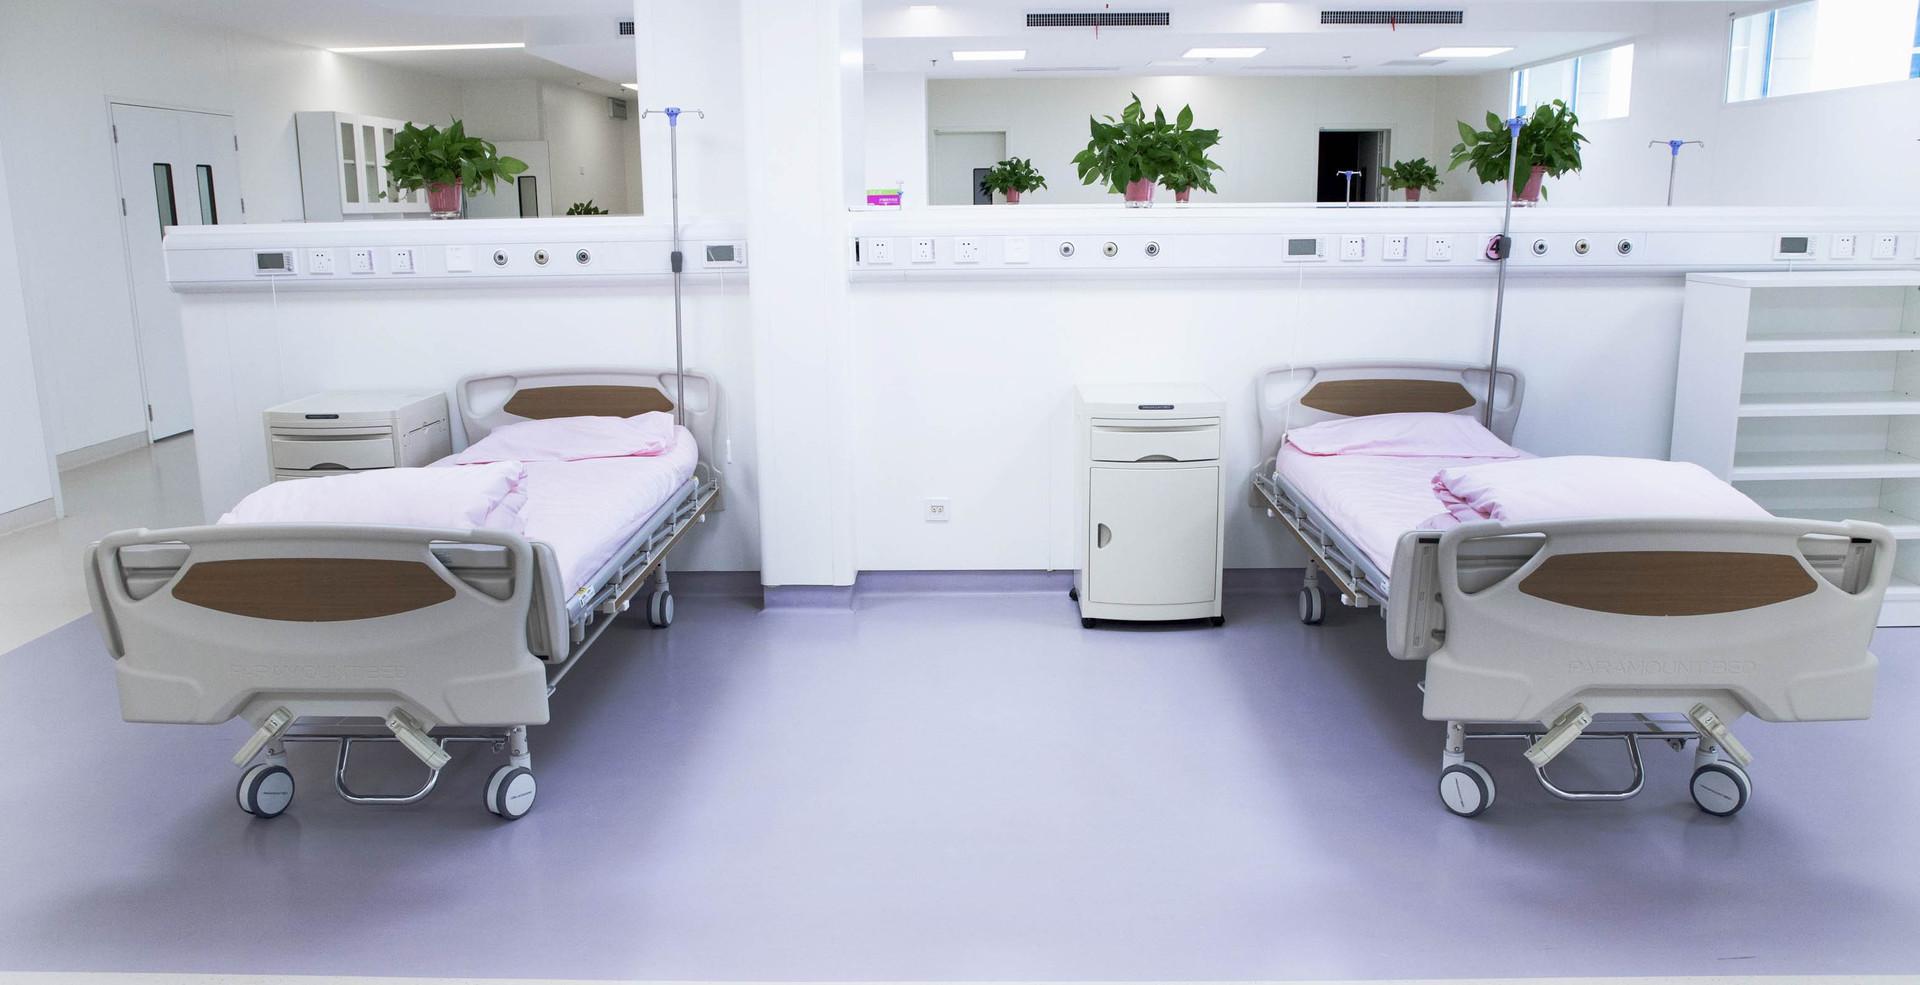 RICA_西安国际医疗_004.jpg